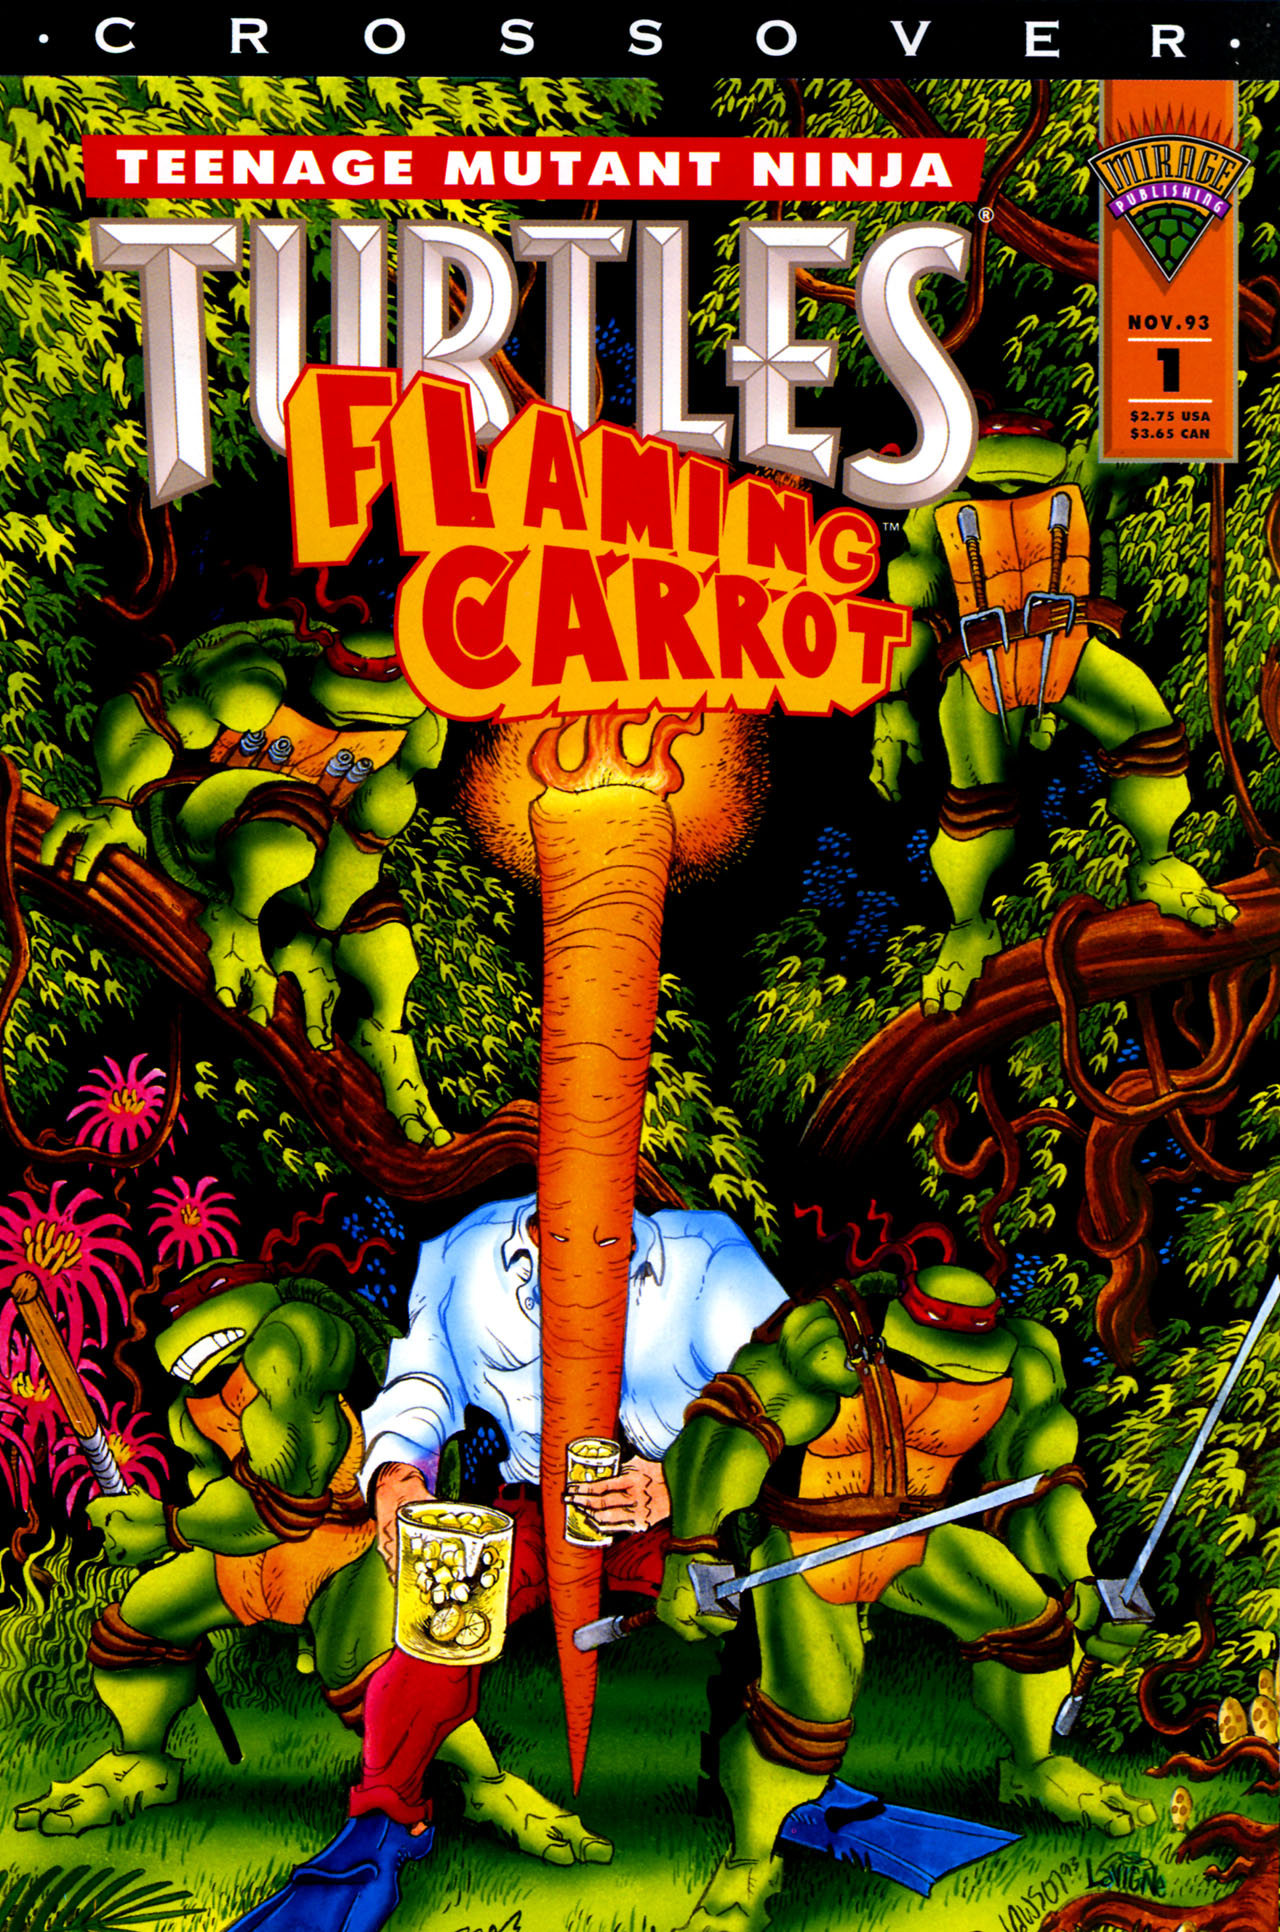 Teenage Mutant Ninja Turtles/Flaming Carrot Crossover 1 Page 1